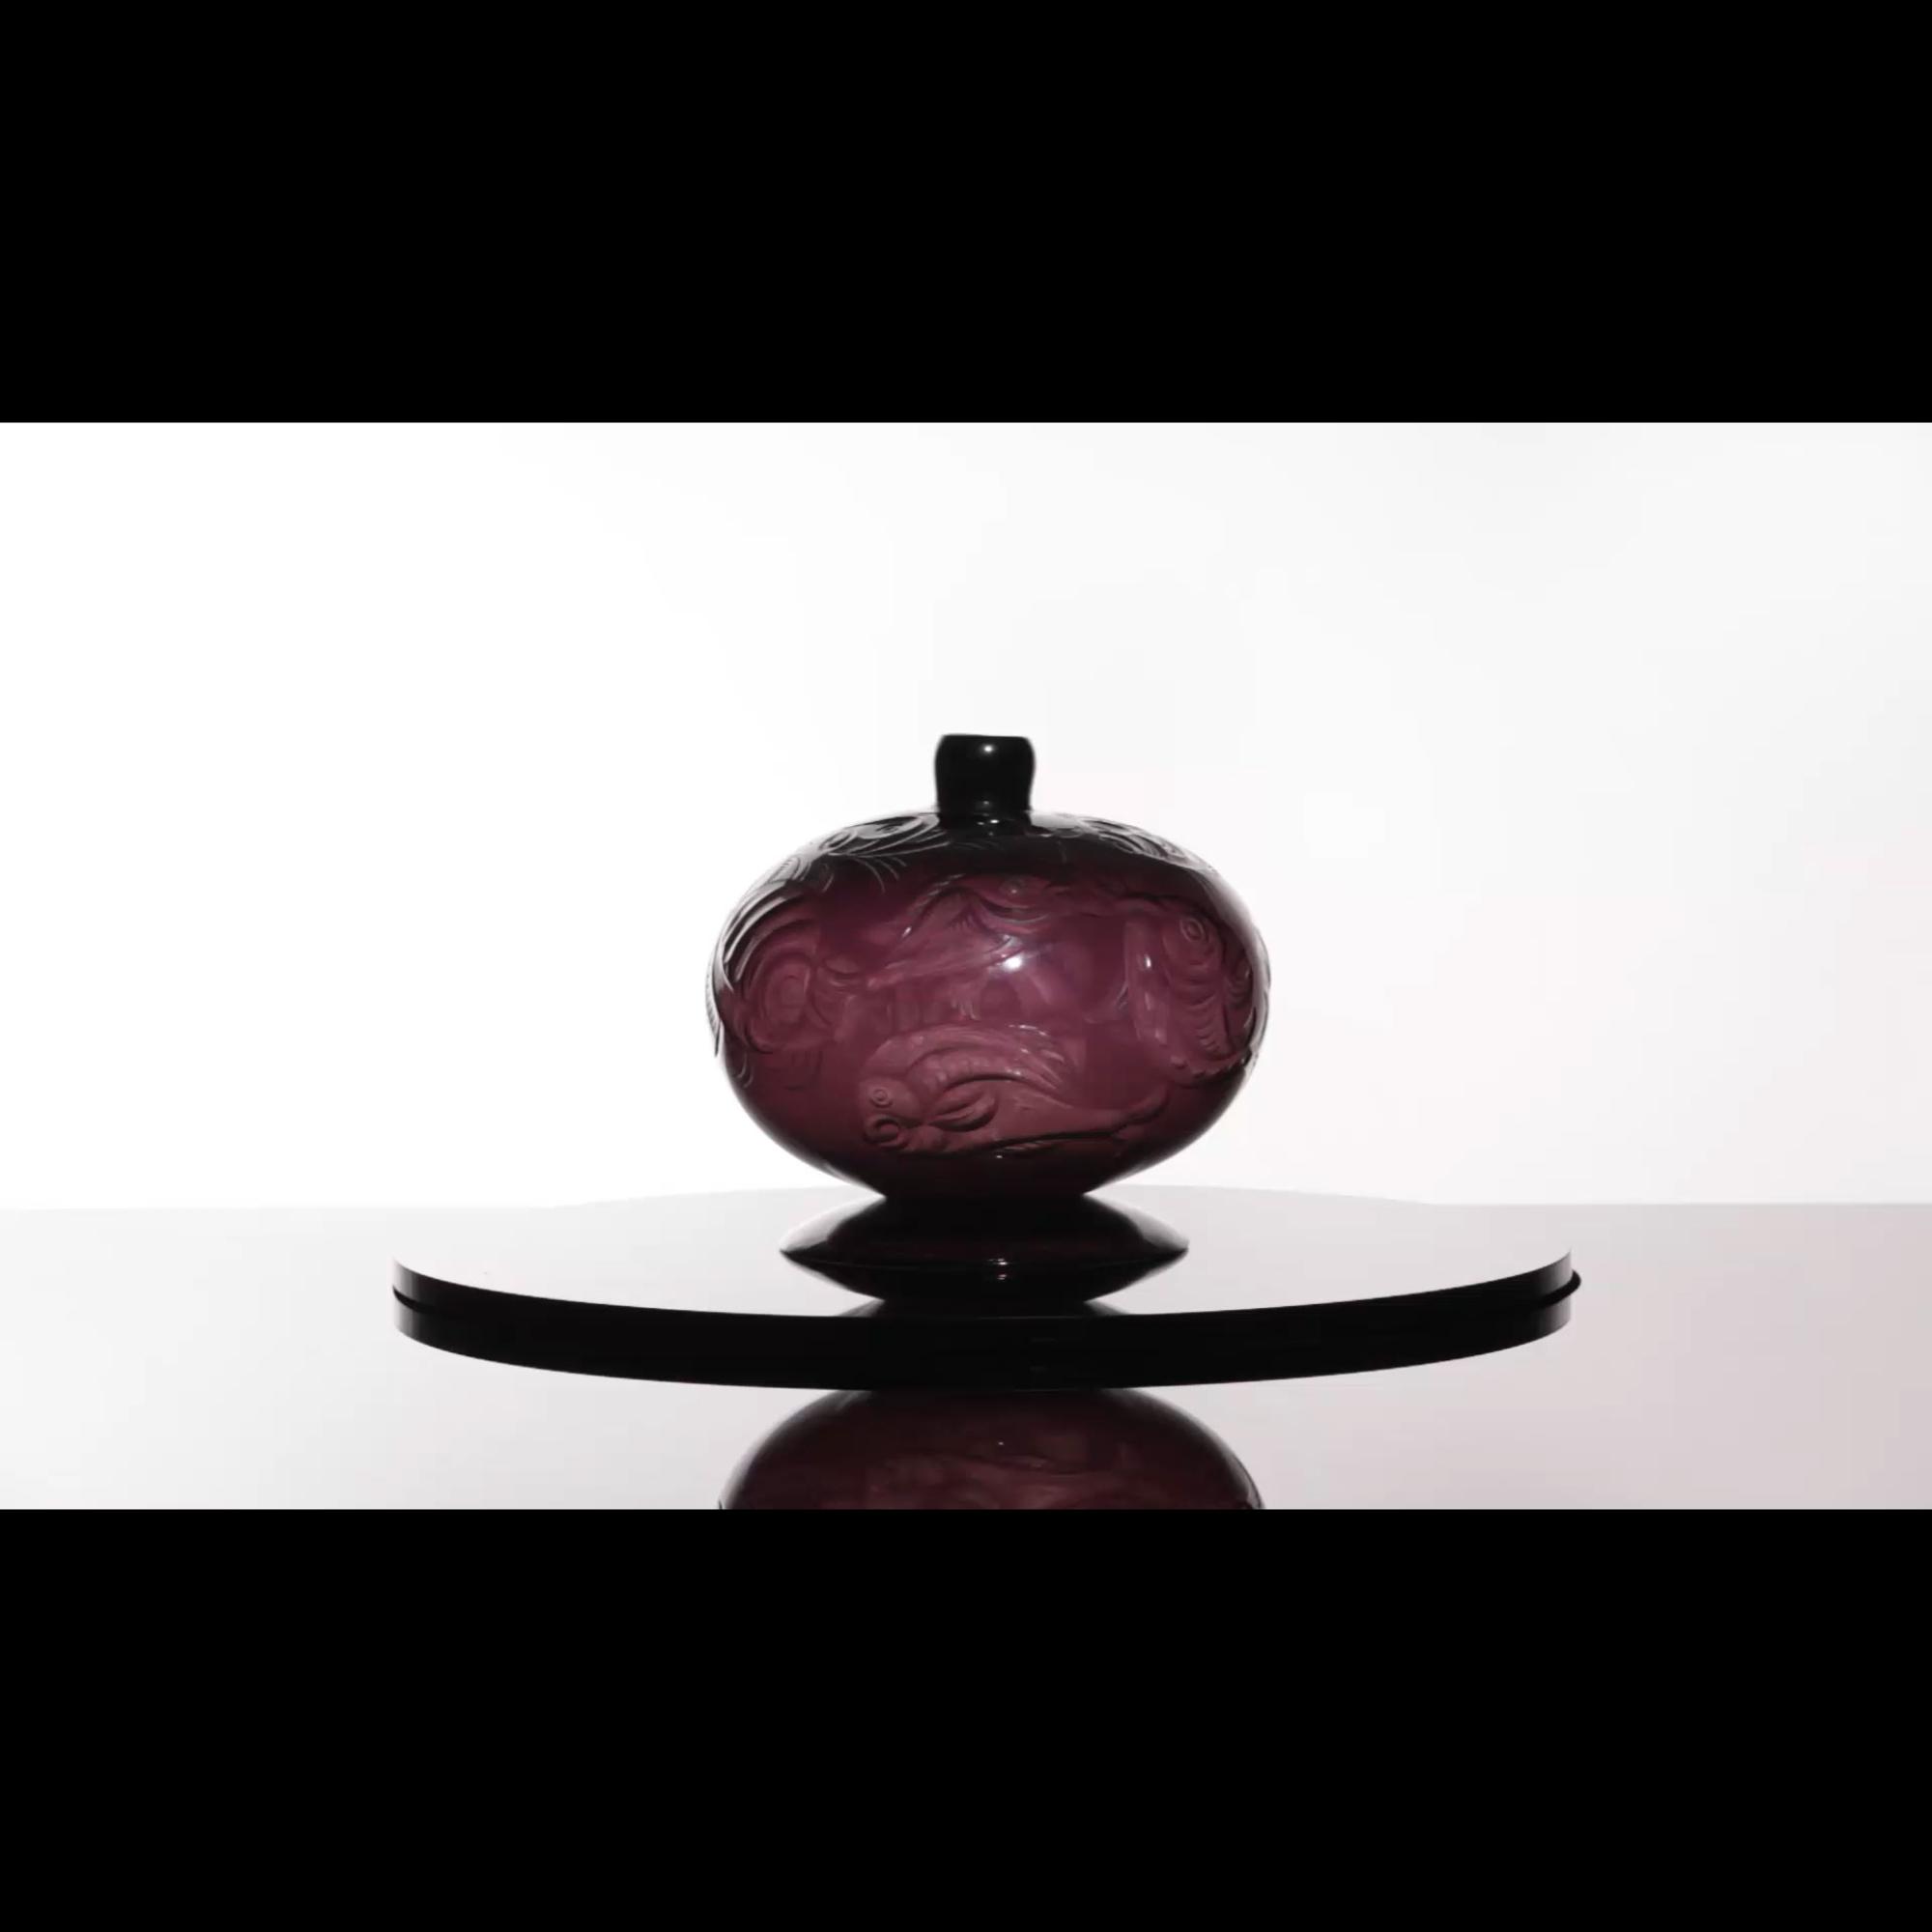 43: Vittorio Zecchin and Franz Pelzel / Unique Pesci vase (1 of 5)